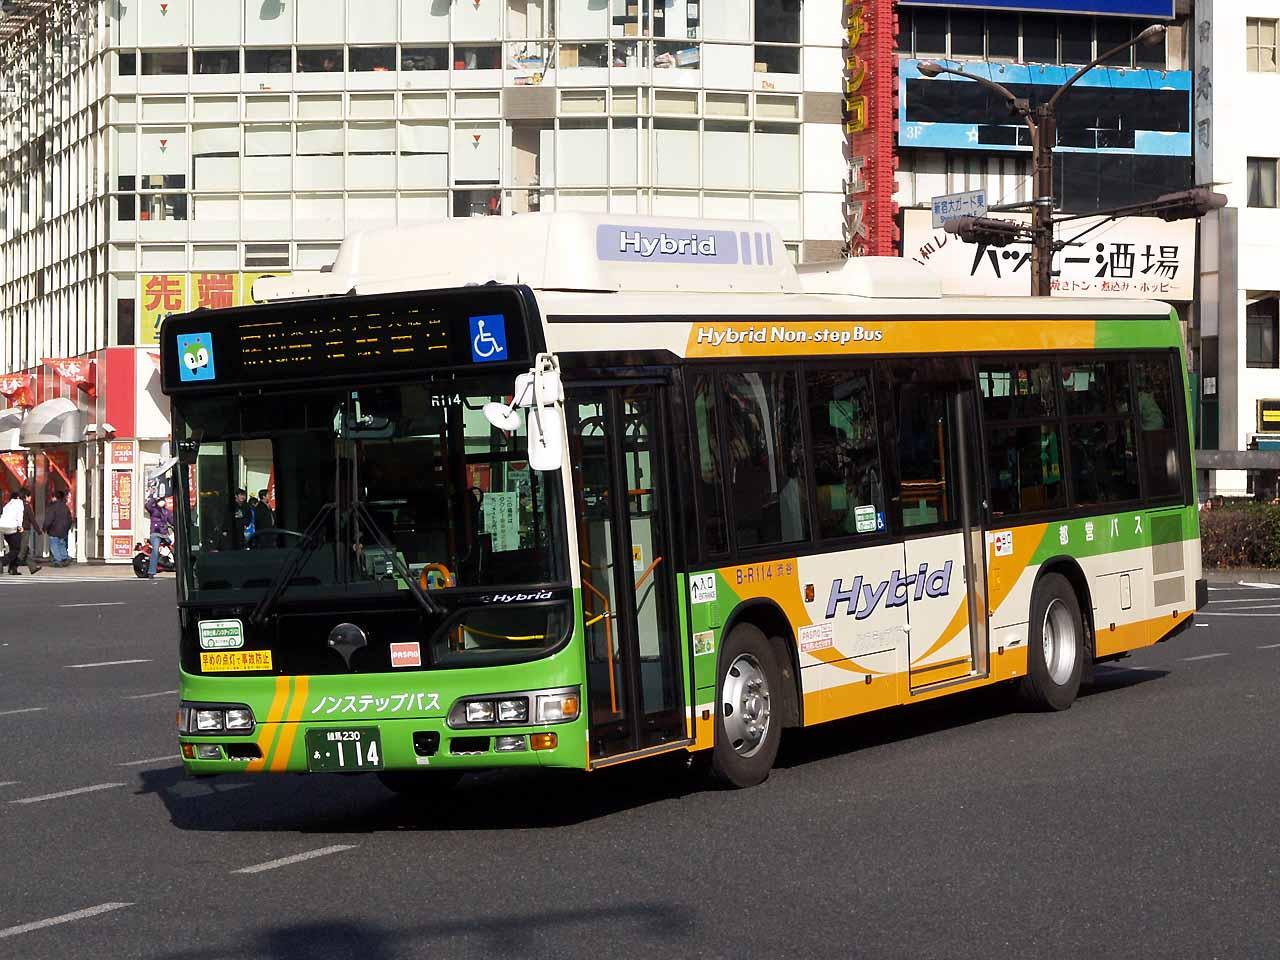 Hybrid electric bus - Wikipedia